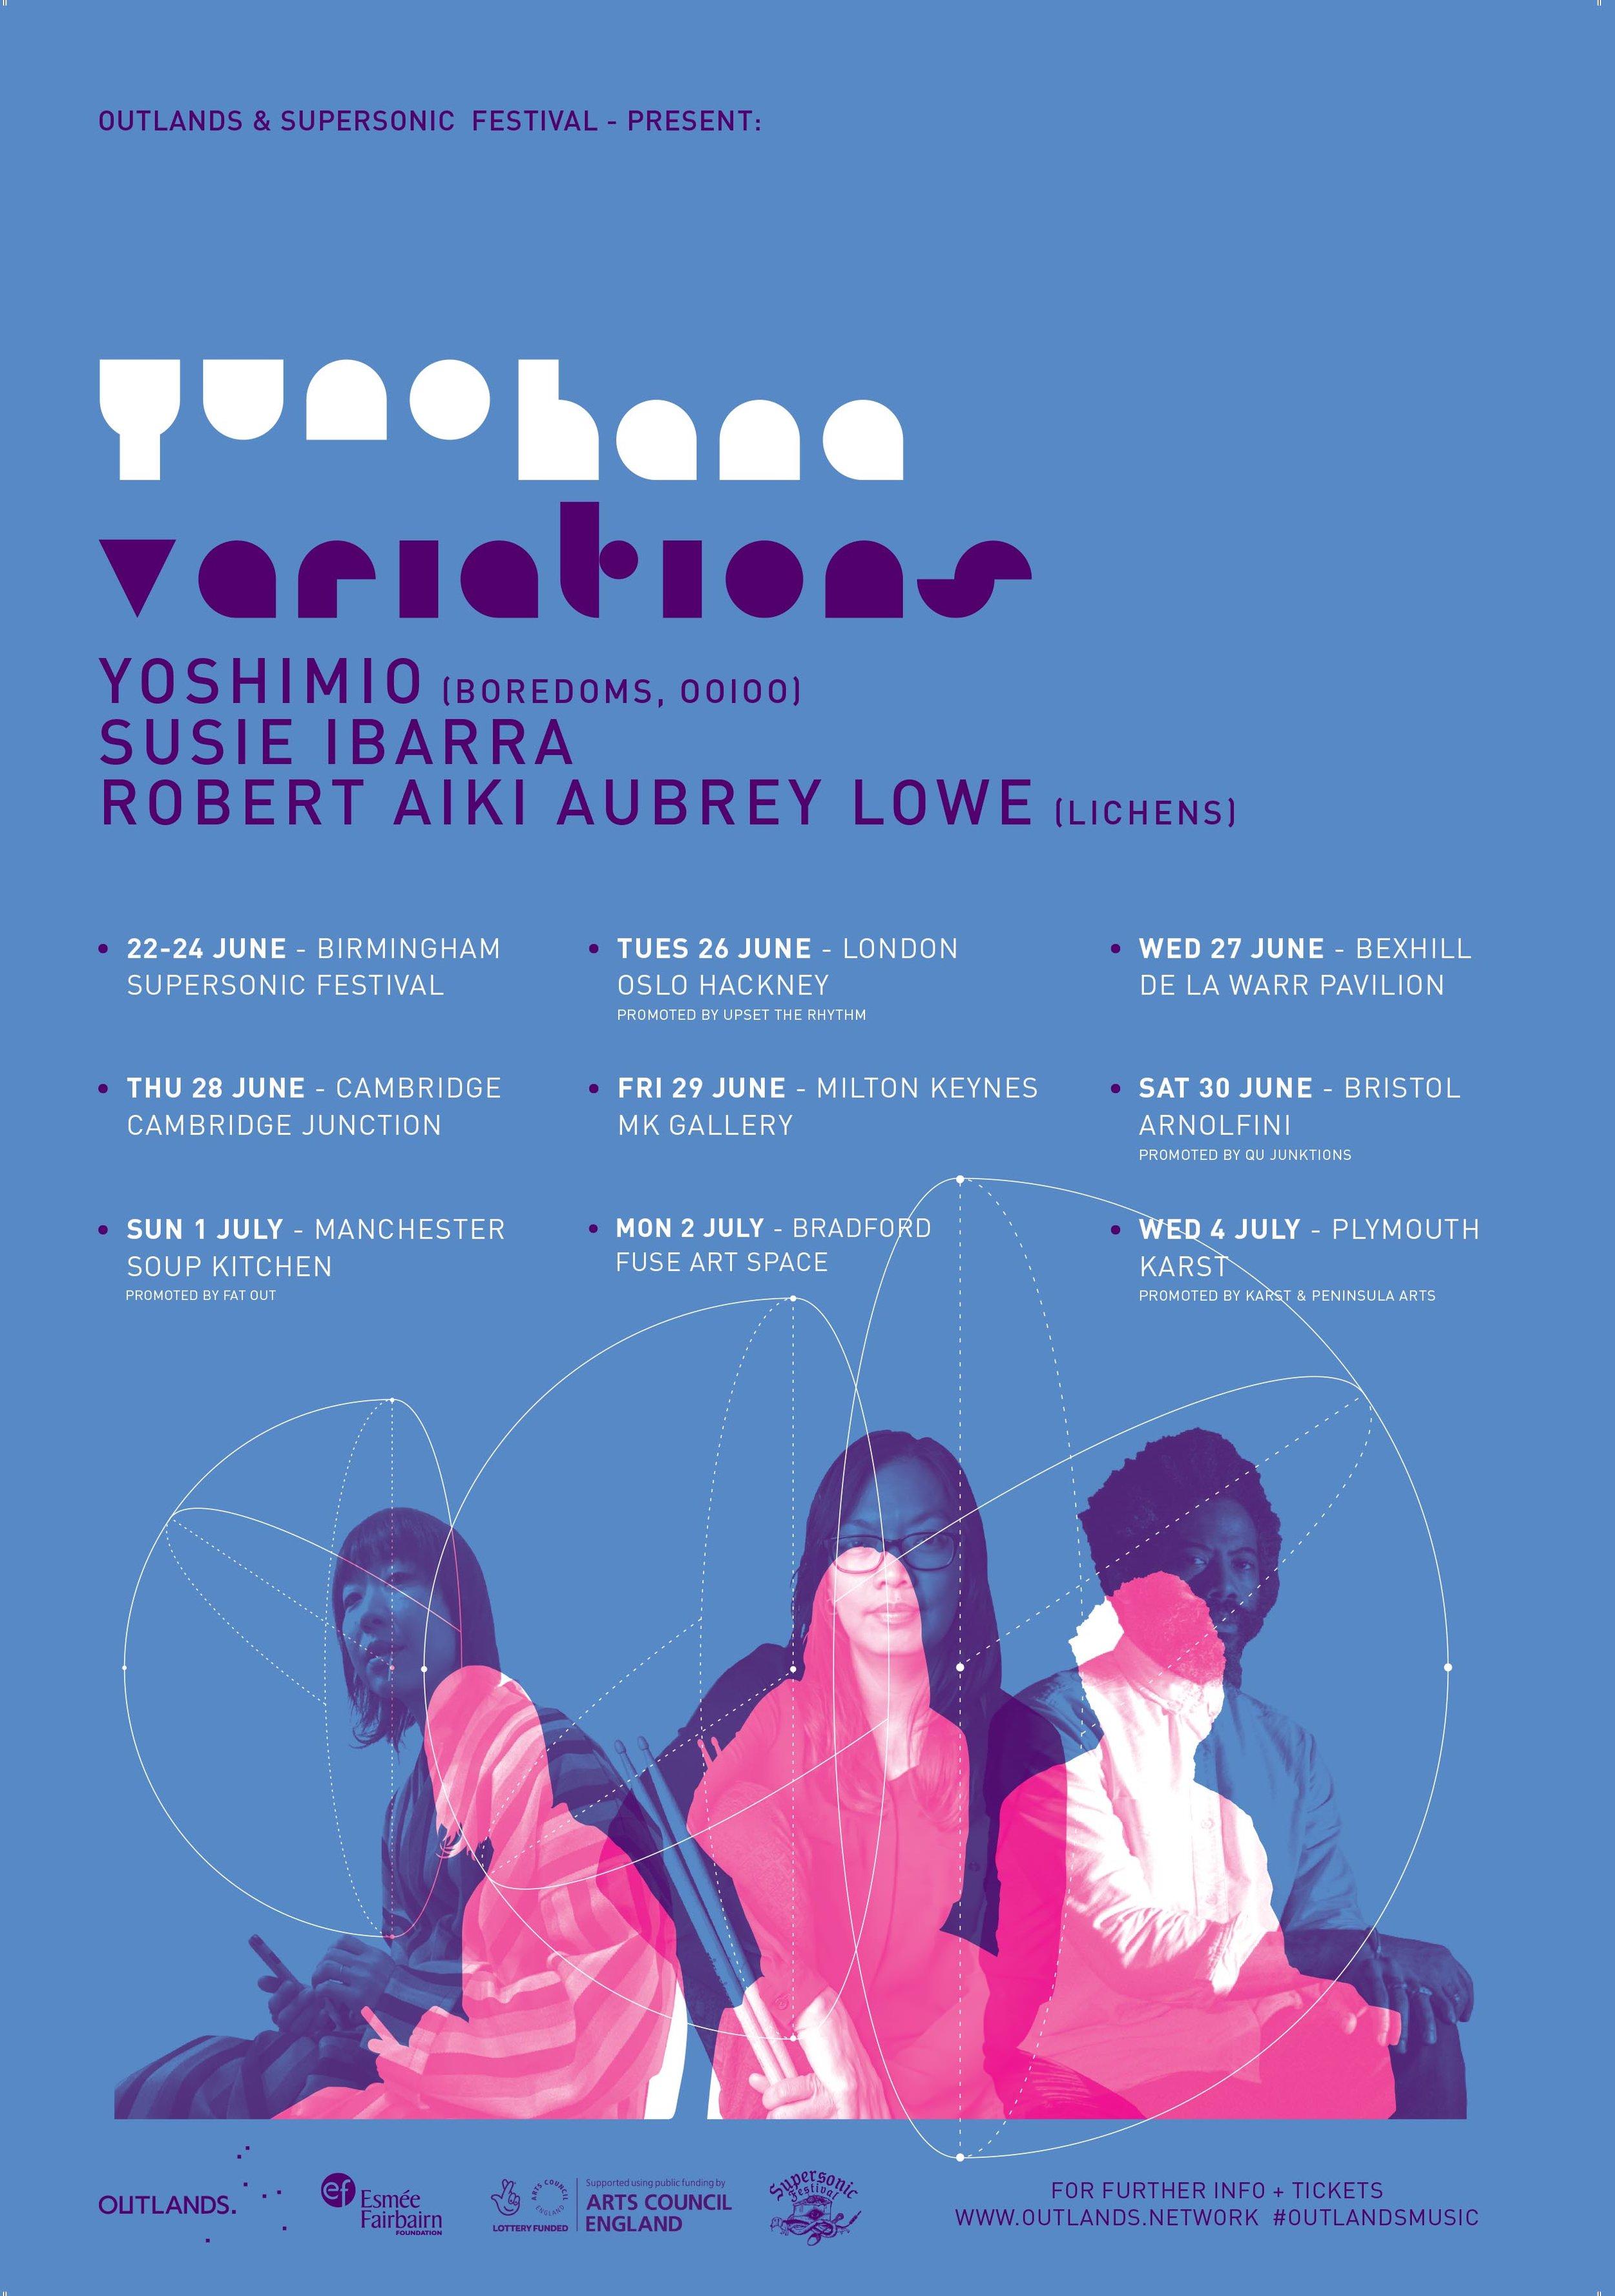 outlands  yunohana A4 poster.jpg